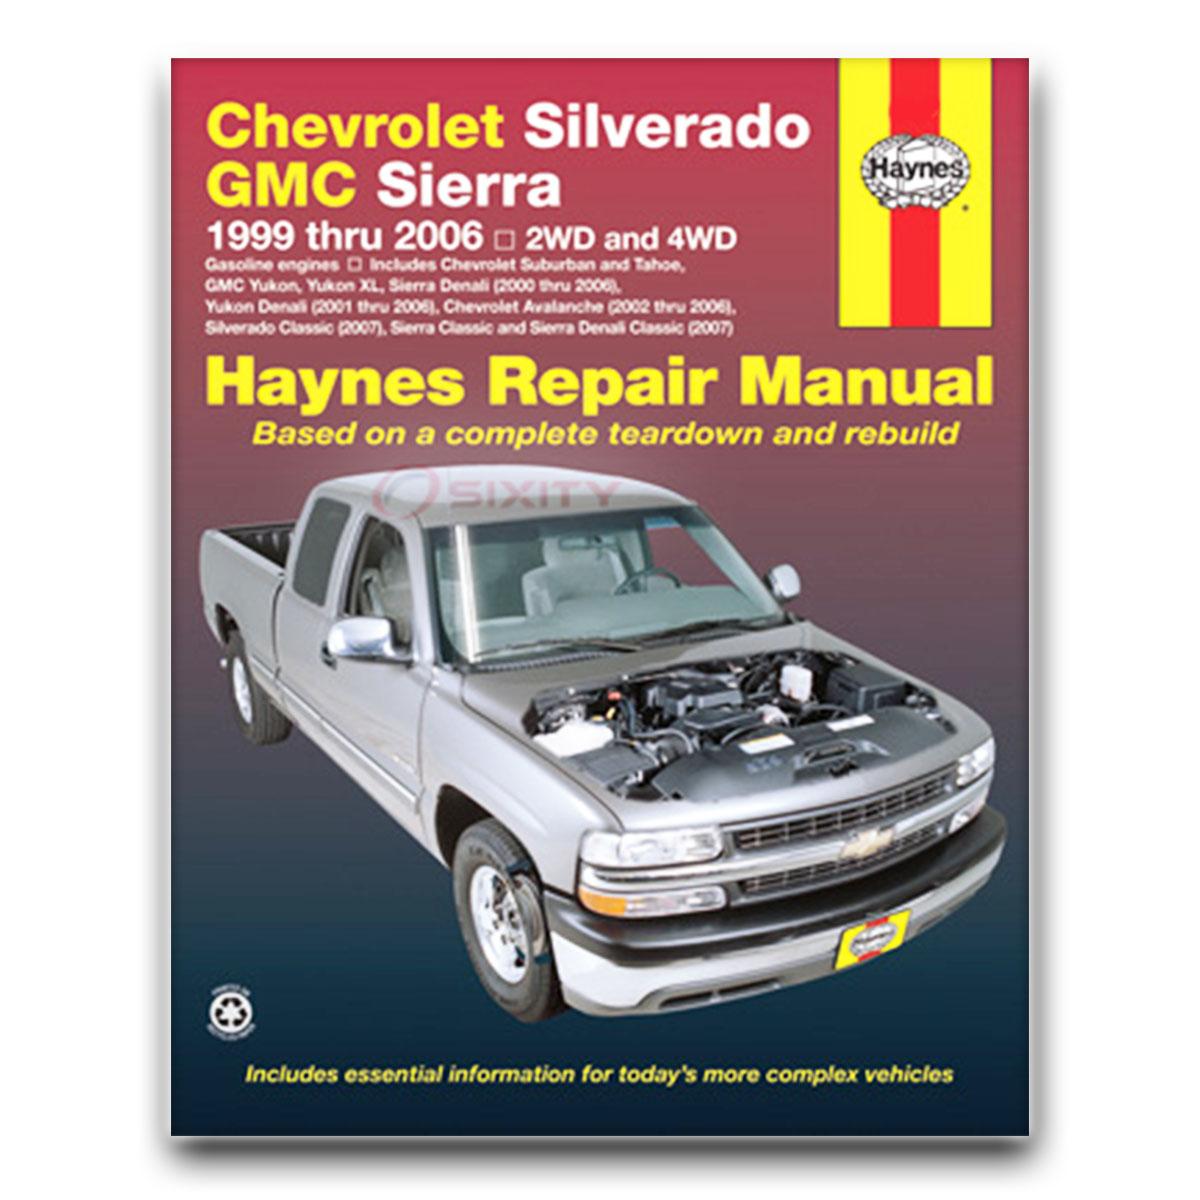 chevy avalanche 1500 haynes repair manual base z66 north face ls z71 rh ebay com 2003 chevy avalanche service manual 2007 chevy avalanche service manual